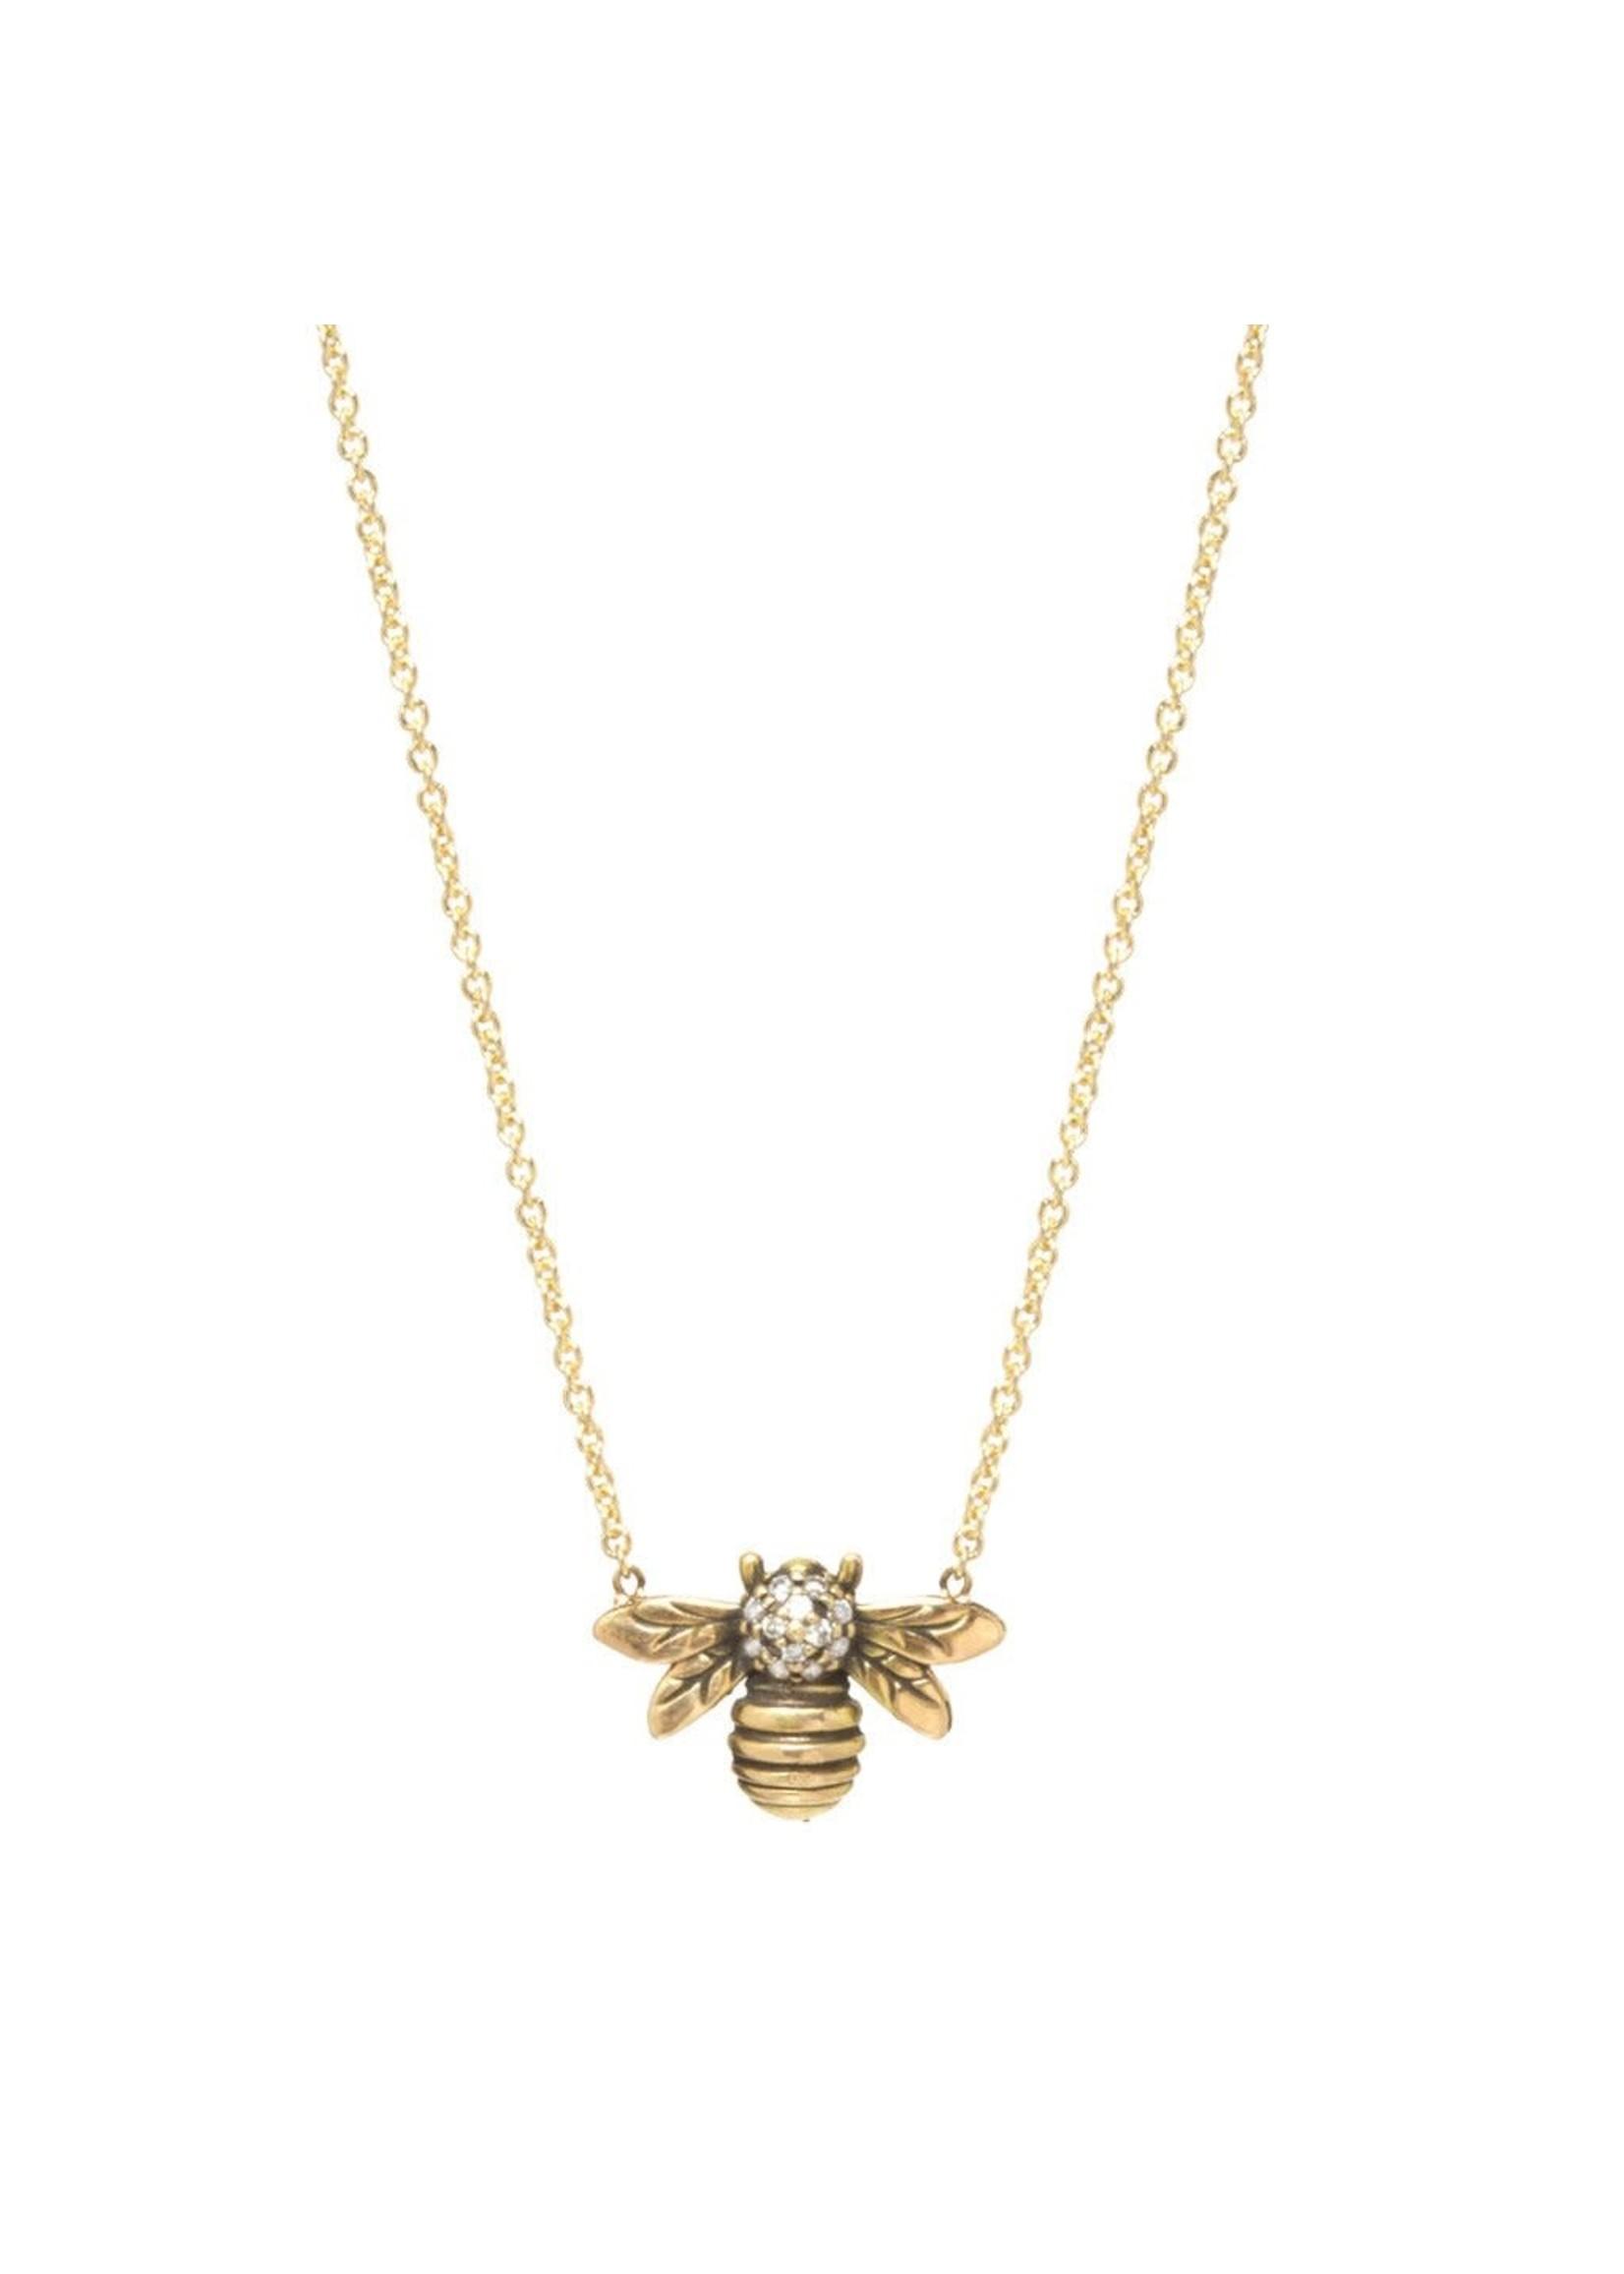 Workhorse Megachile Pluto Bee Necklace